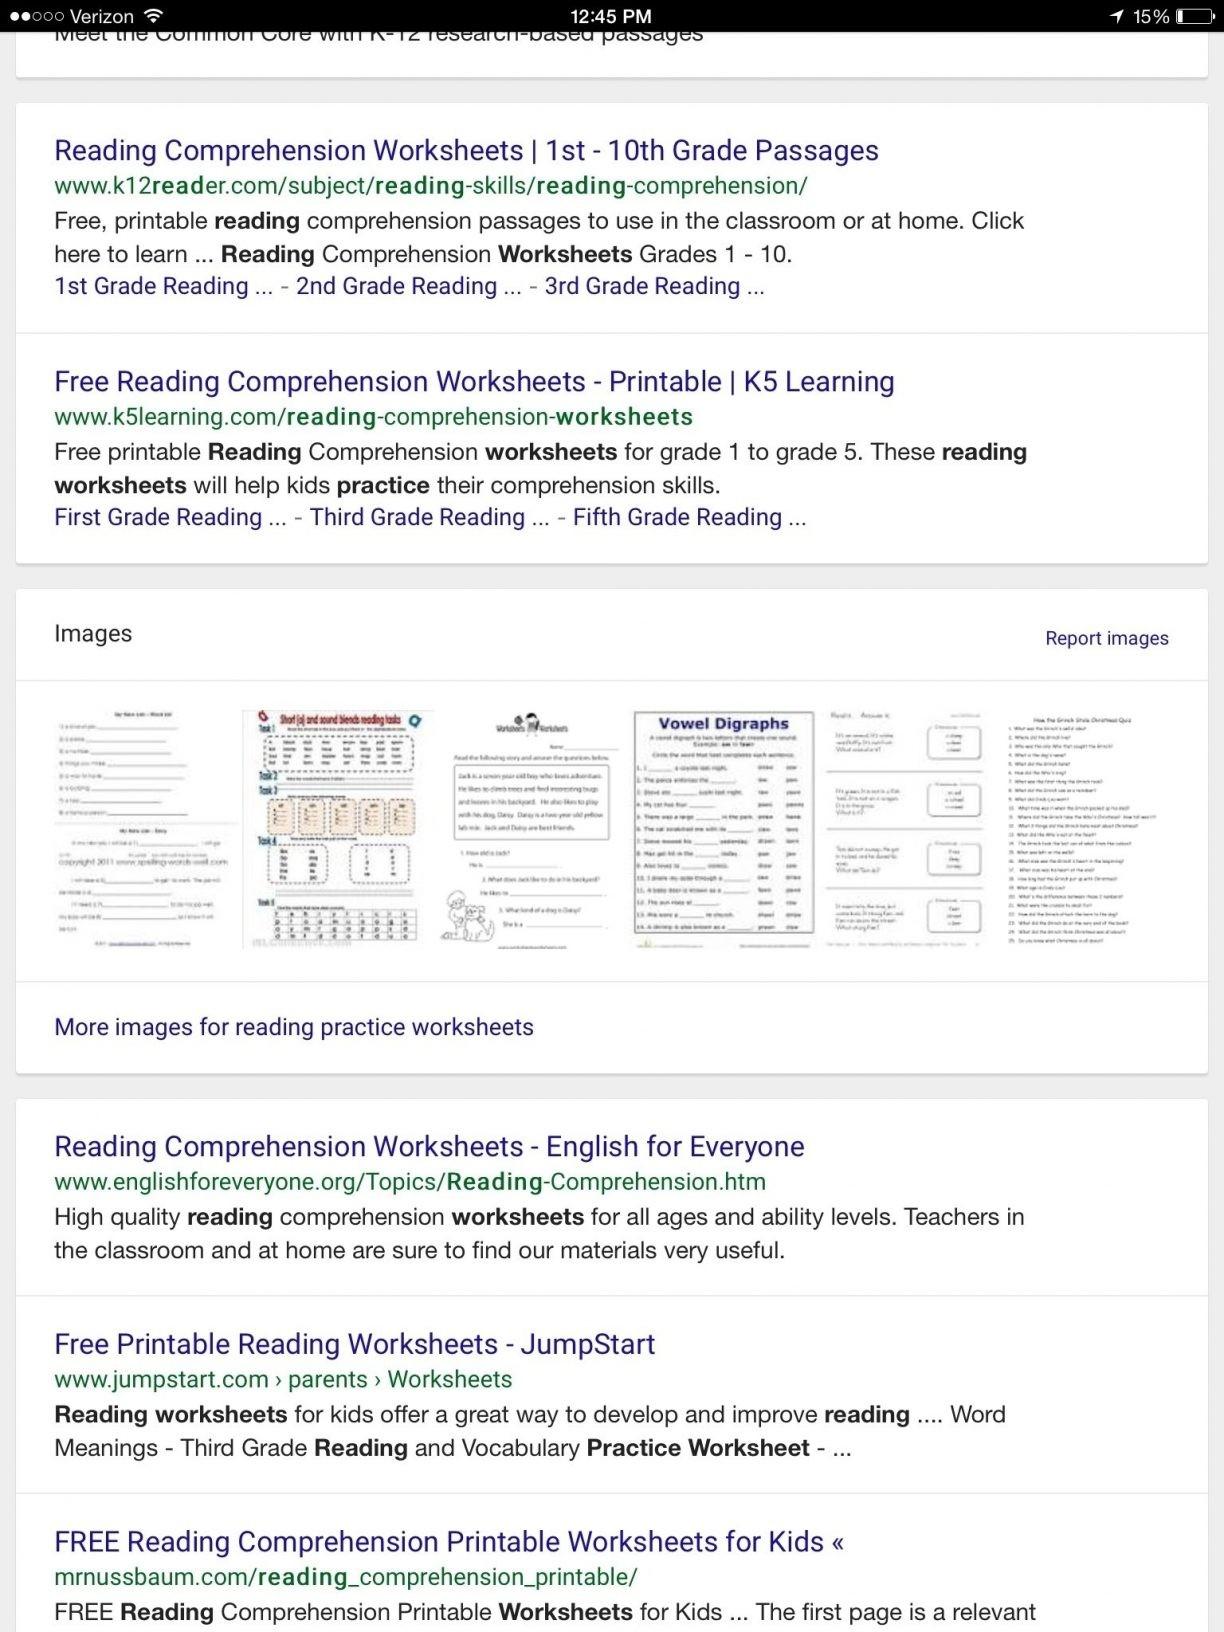 Free Printable Reading Comprehension Worksheets Grade 5 For 1 1224 - Free Printable Reading Comprehension Worksheets Grade 5